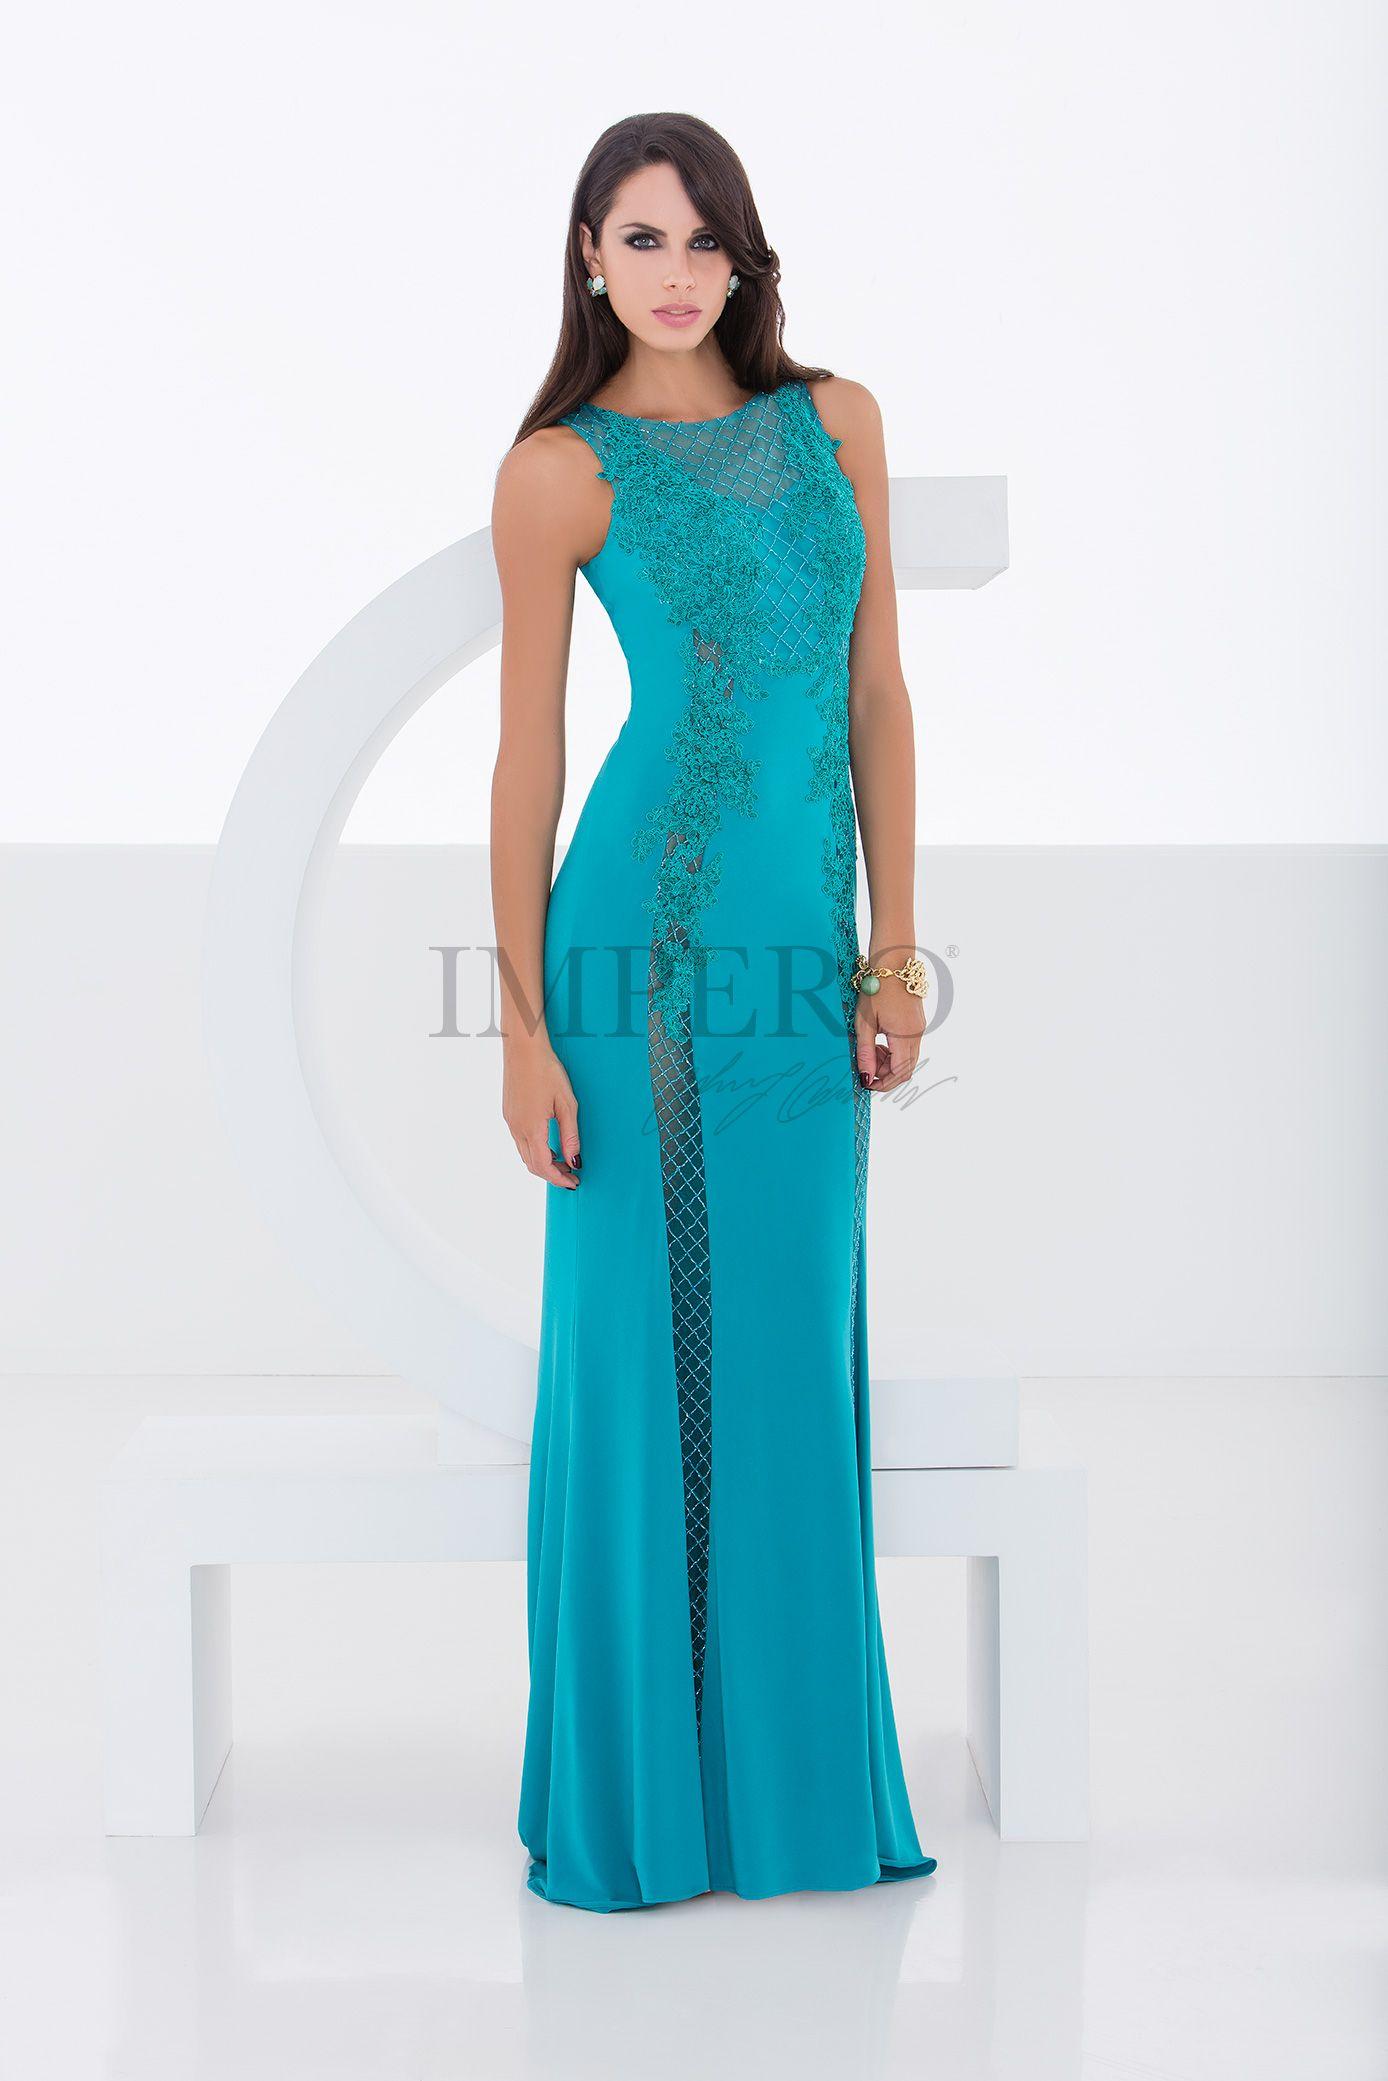 DS 20131L #abiti #dress #wedding #matrimonio #cerimonia #party ...